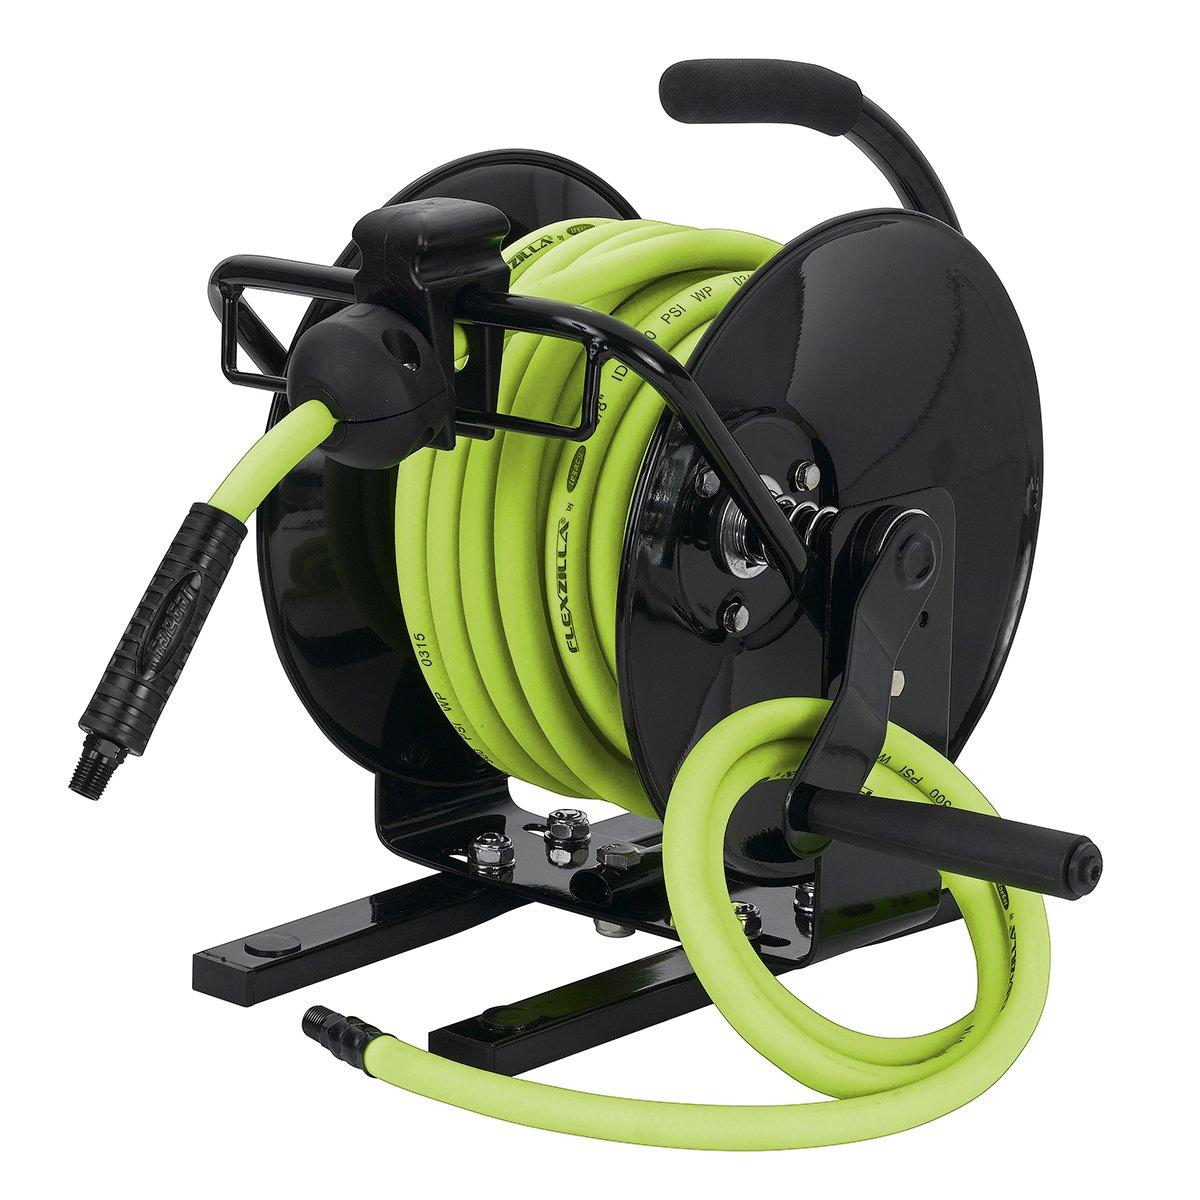 Flexzilla Portable Manual Open Face Air Hose Reel, 3/8 in. x 50 ft., Heavy Duty, Lightweight, Hybrid, ZillaGreen - L8651FZ